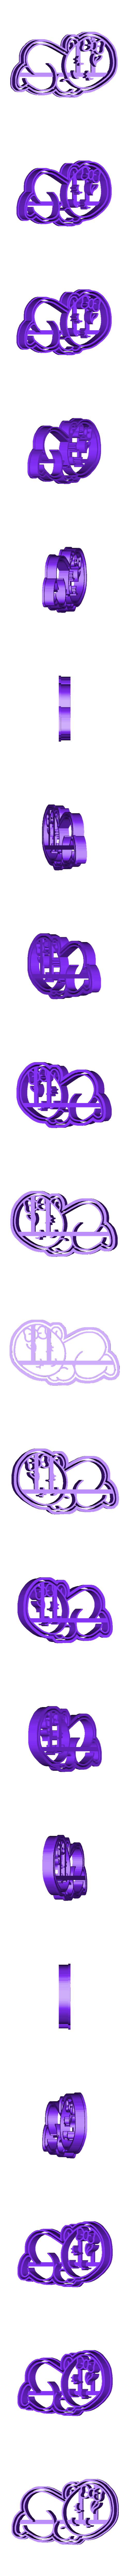 BM1.stl Download STL file BABY COOKIE CUTTER • 3D printable model, SinTiempoLibre